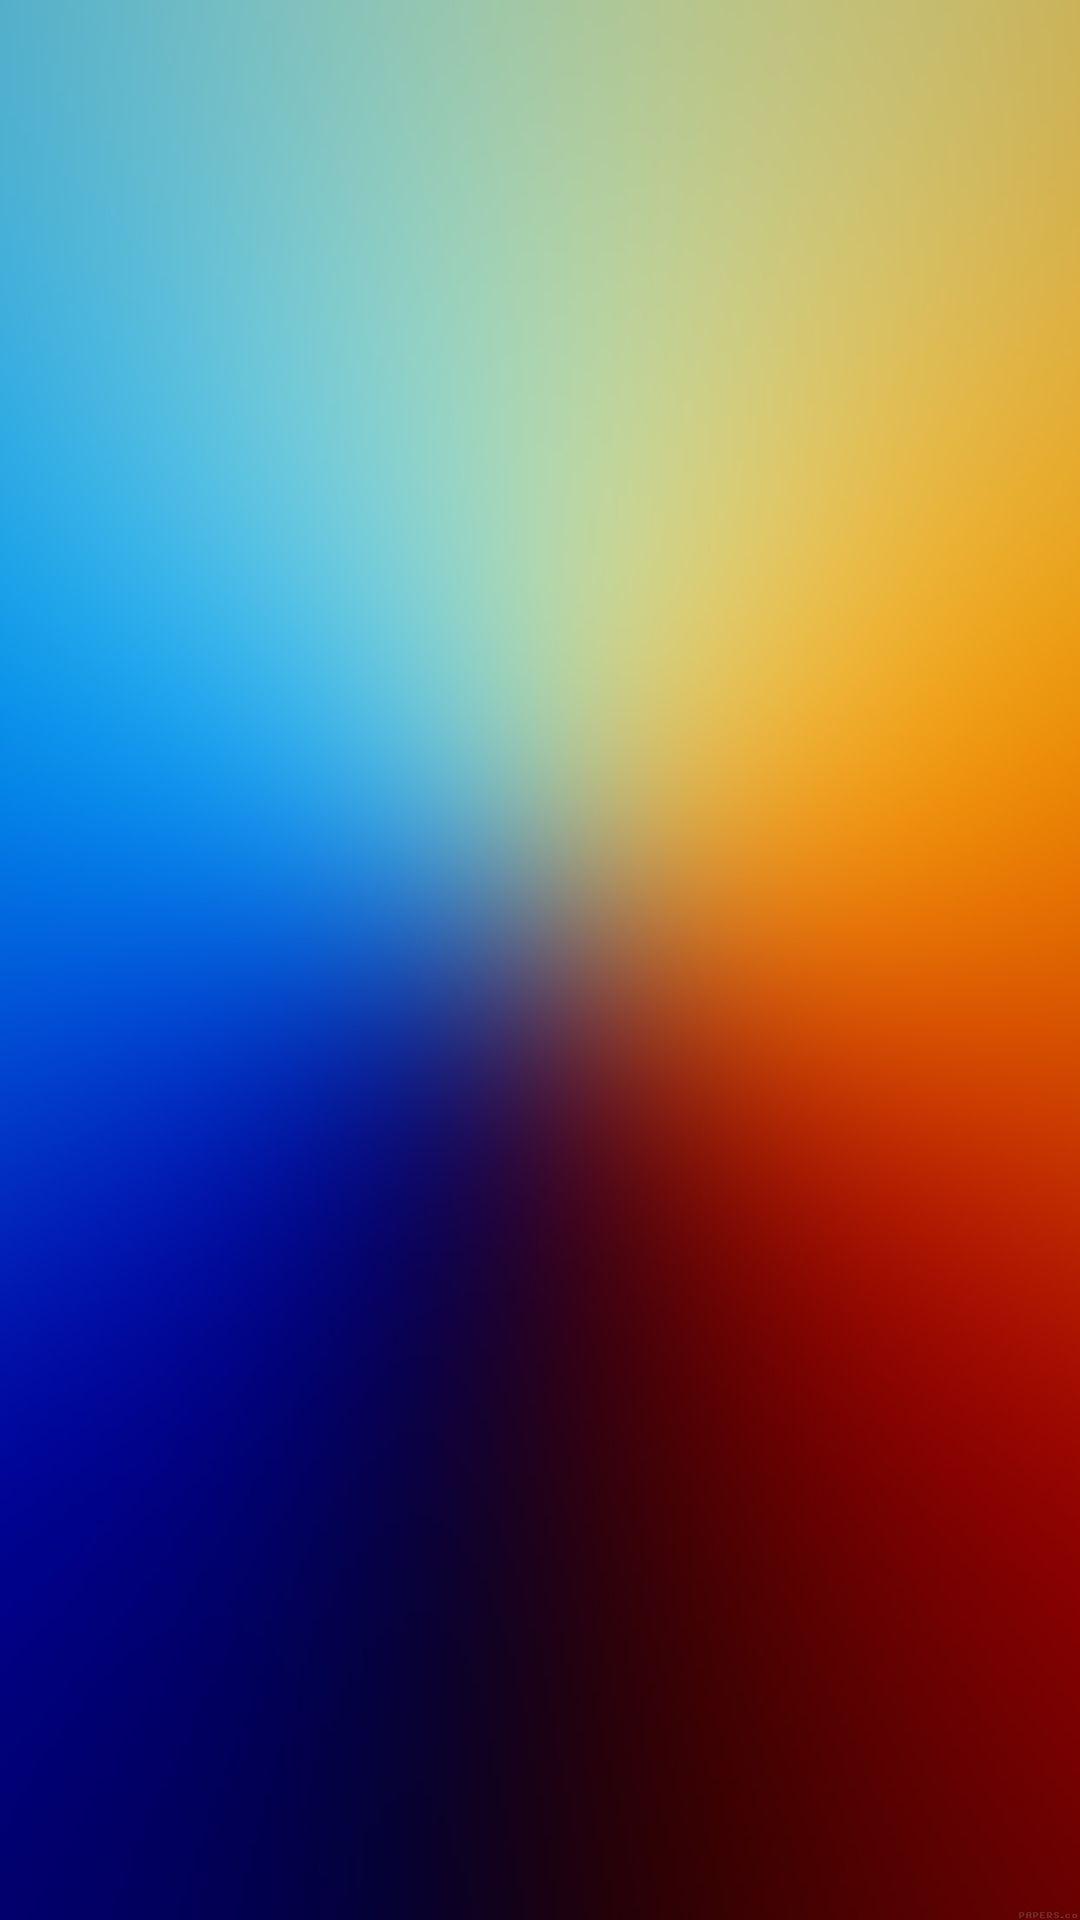 Rainbow Circle Gradation Blur Iphone 6 Wallpaper Rainbow Wallpaper Free Iphone Wallpaper Android Phone Wallpaper